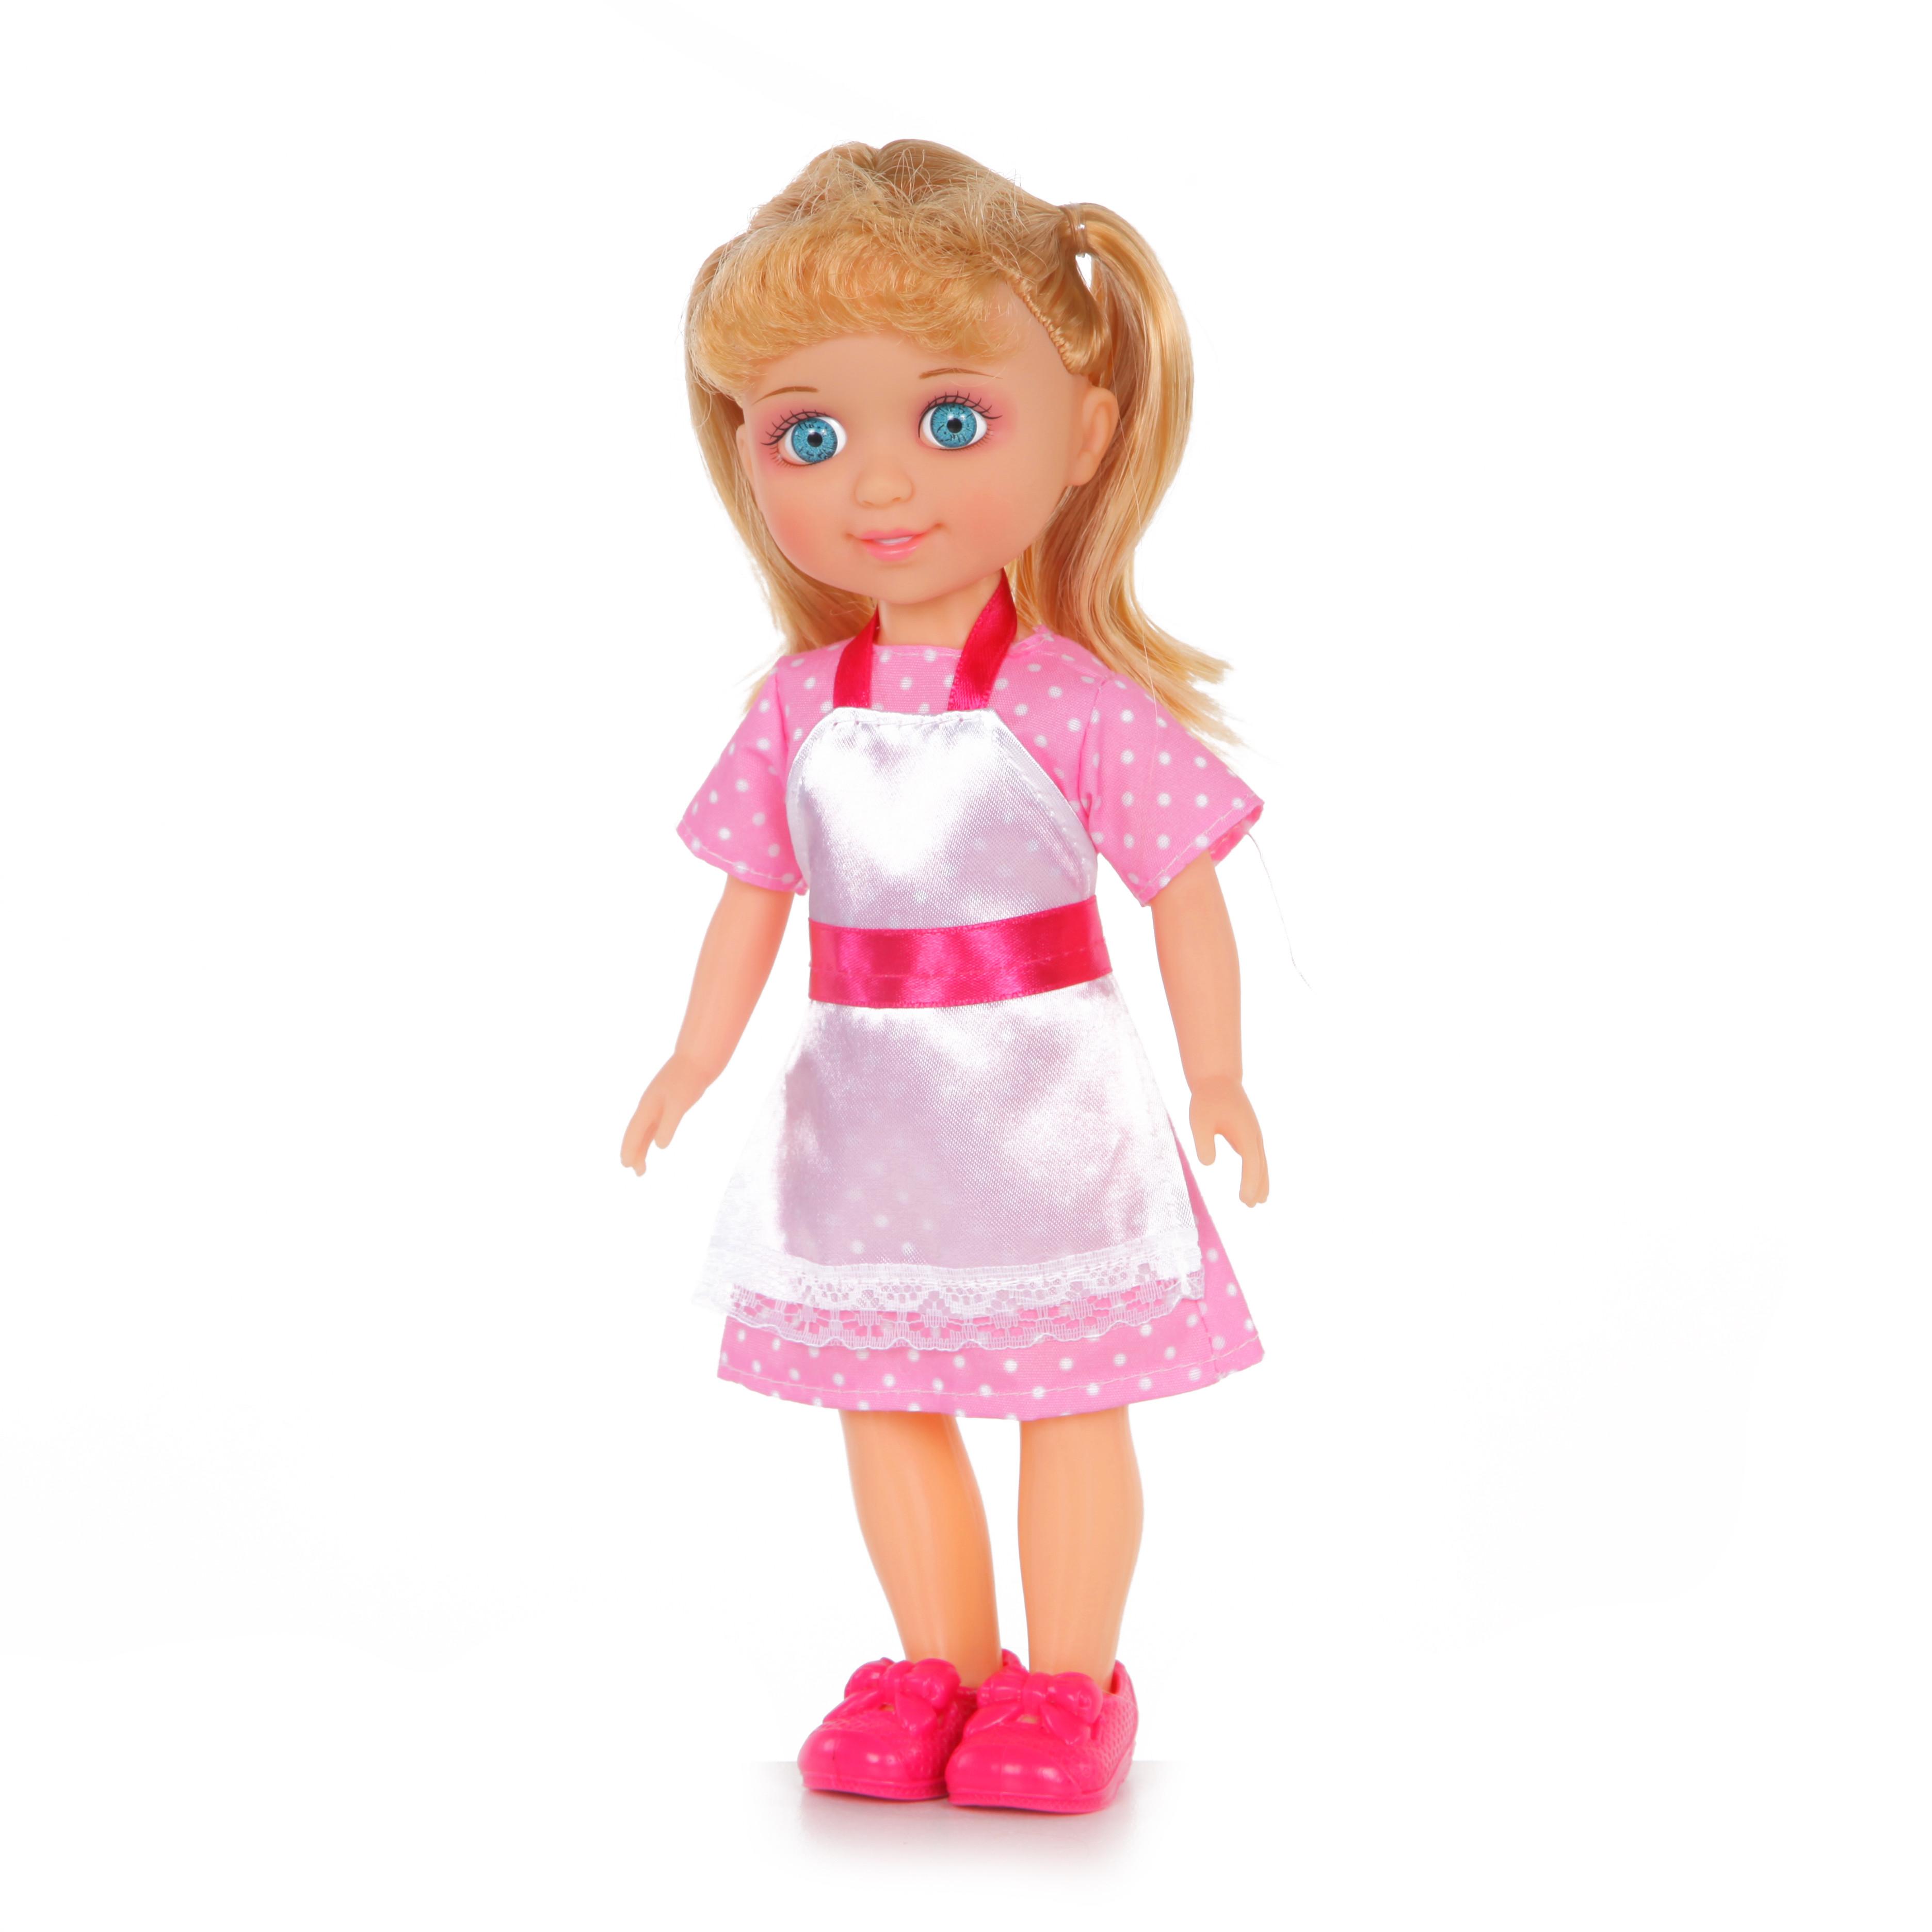 Другие куклы YAKO Кукла Yako Jammy «Хозяюшка» 25 см кукла yako m6289